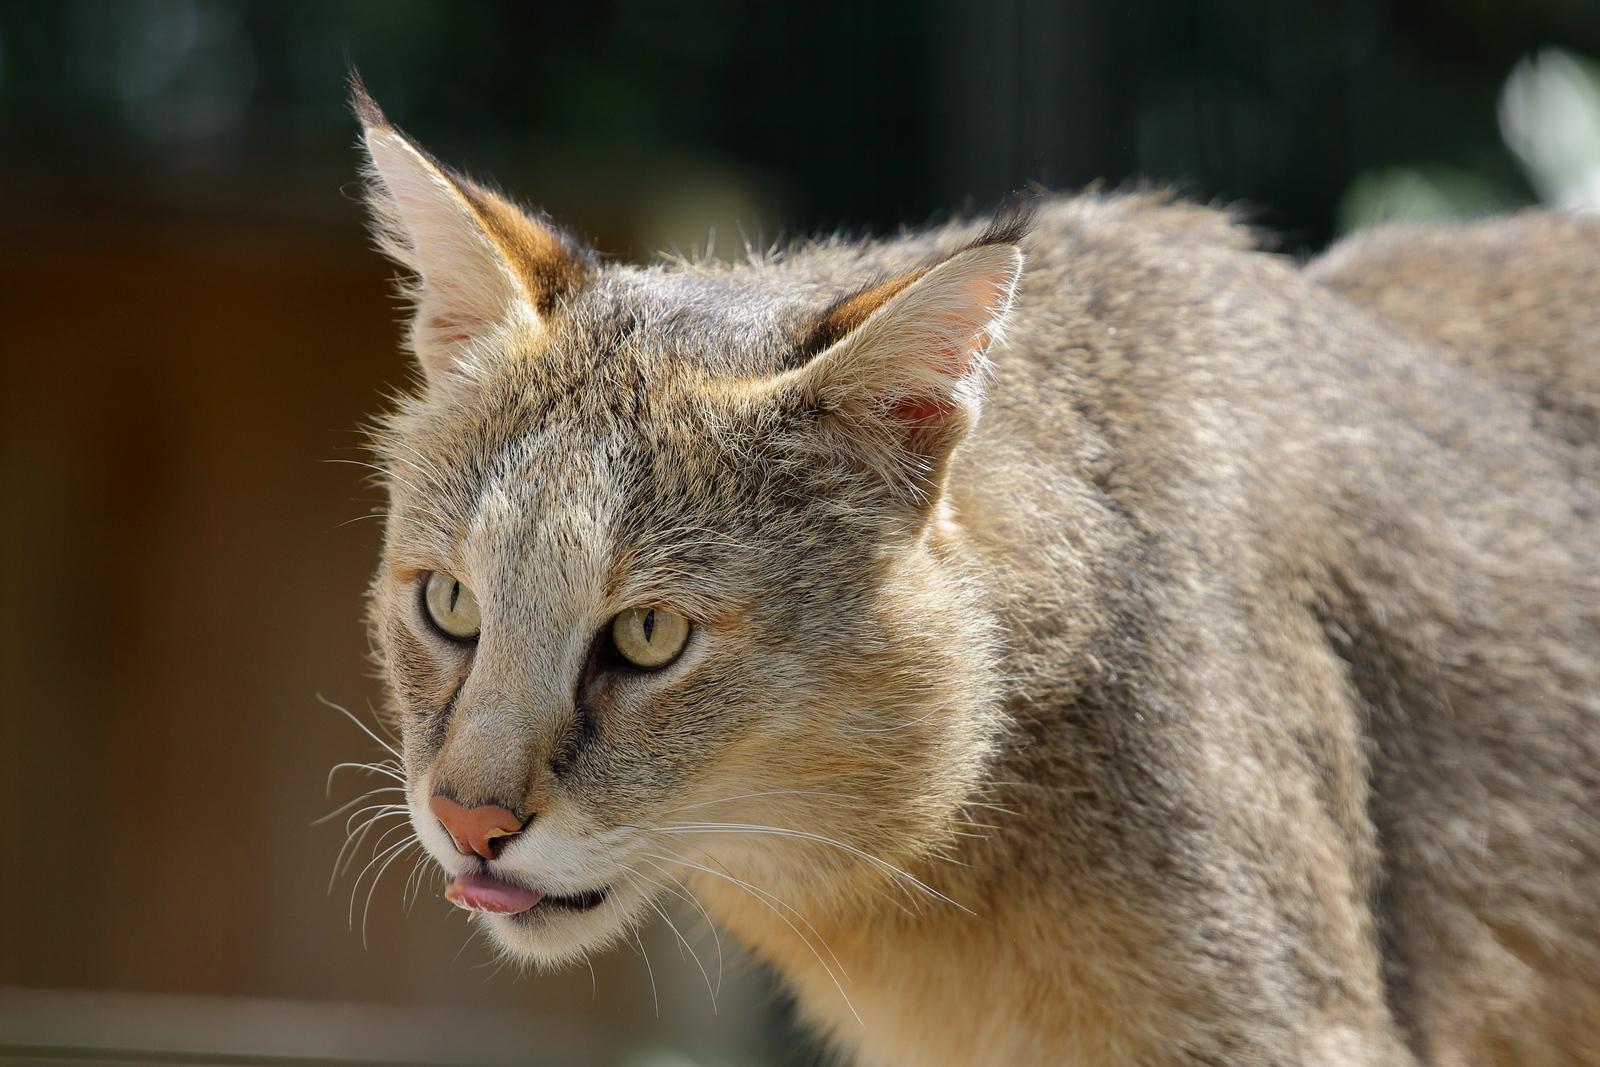 IMAGE: https://photos.smugmug.com/Earths-Other-Residents/Big-Cats/i-LKC9hZK/0/268ffa25/X3/00021668-X3.jpg